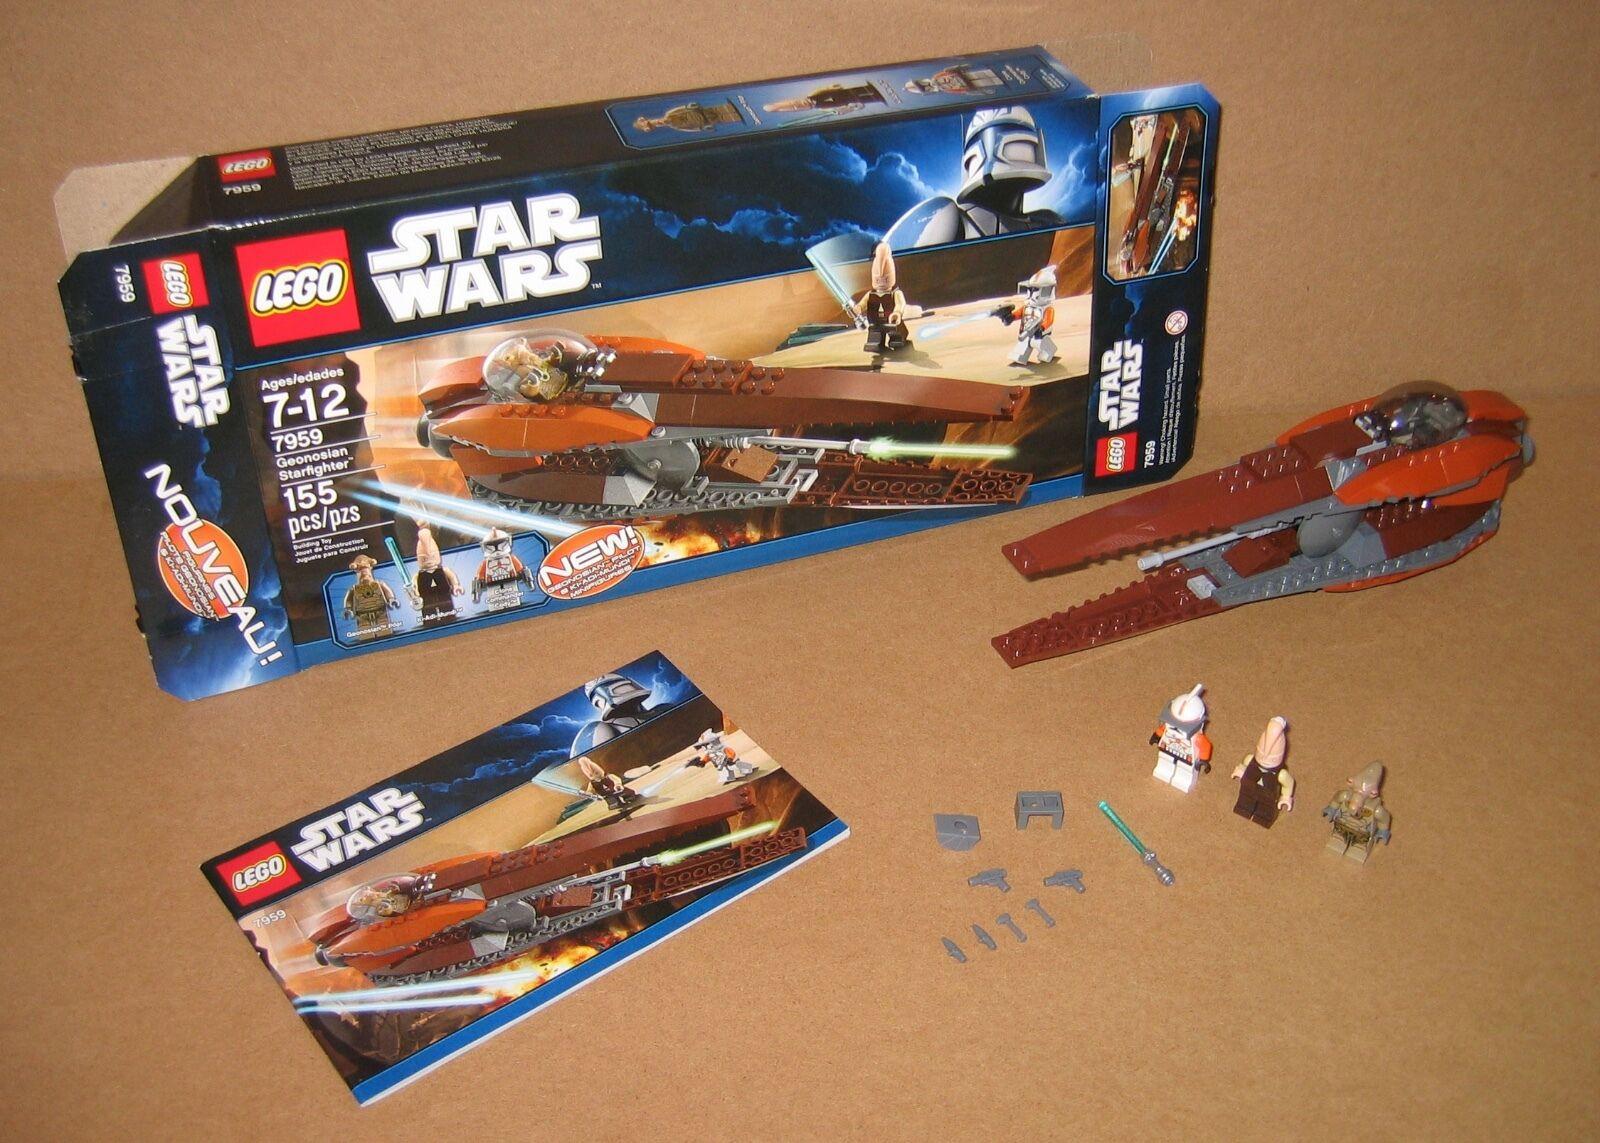 7959 Lego Estrella Wars Geonosian Estrellafighter 100% Completo Caja Manual ex Cond 2011